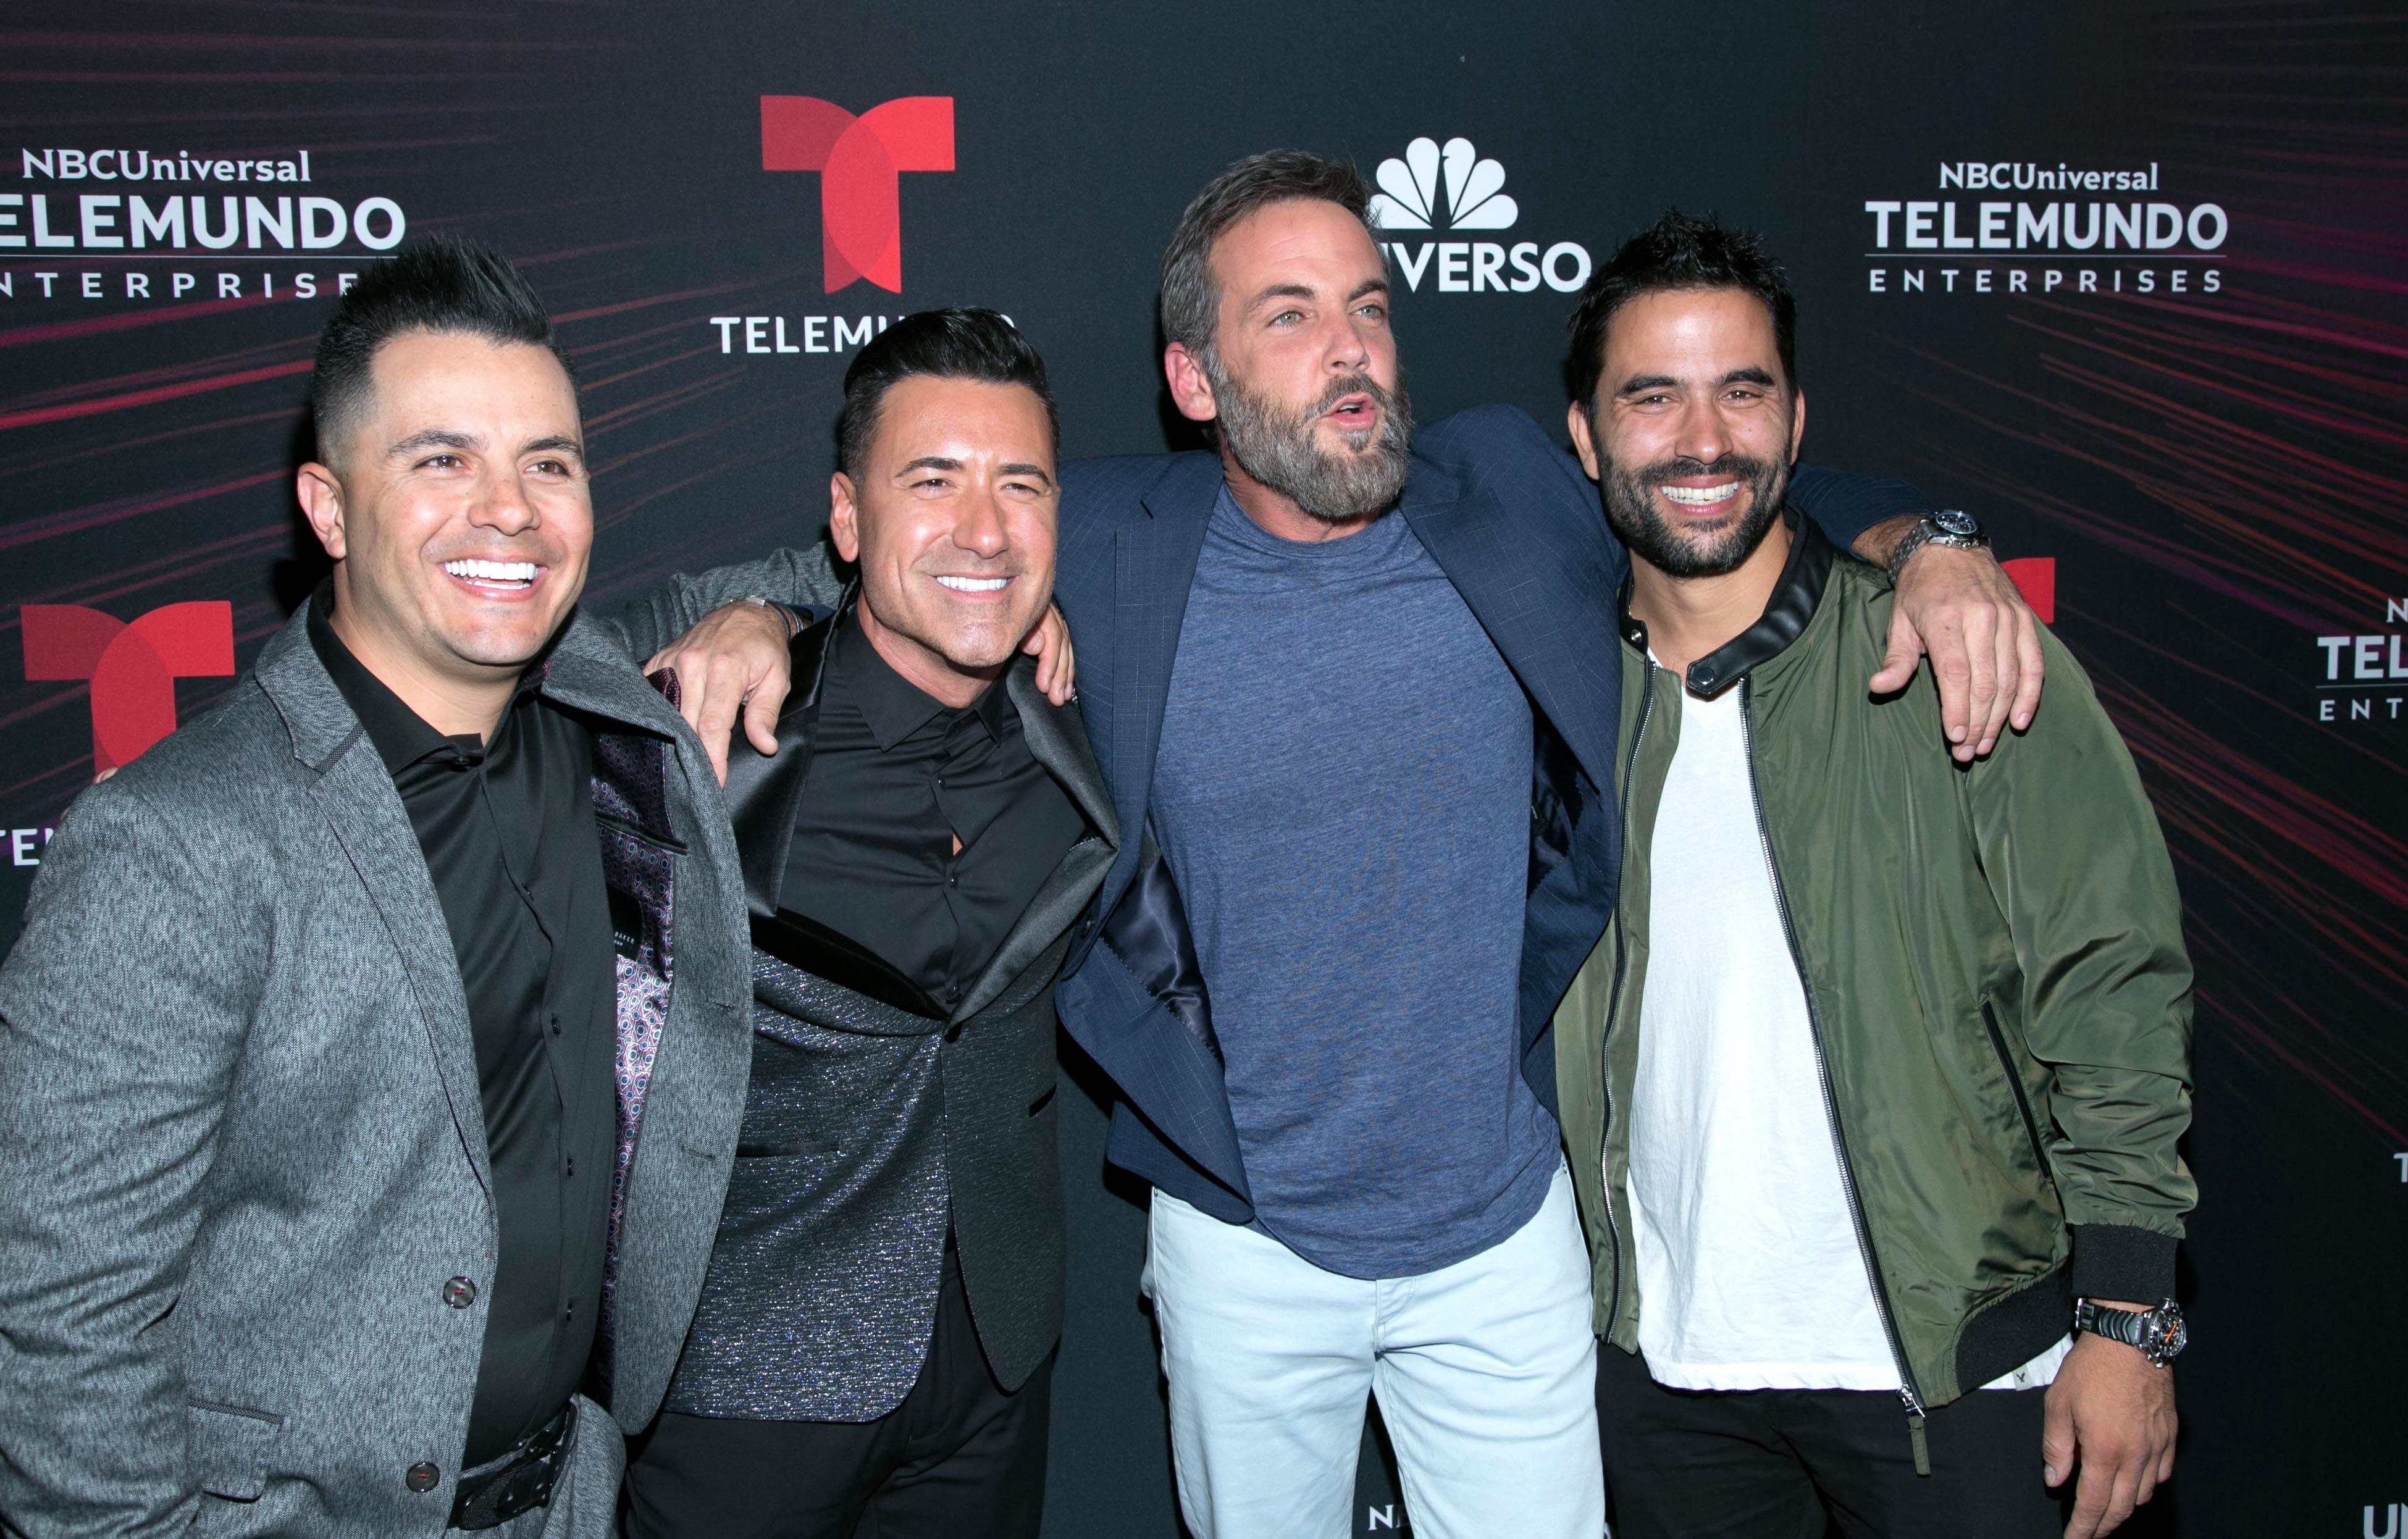 Carlos Ponce, Jorge Bernal, Ignacio Sarracchio